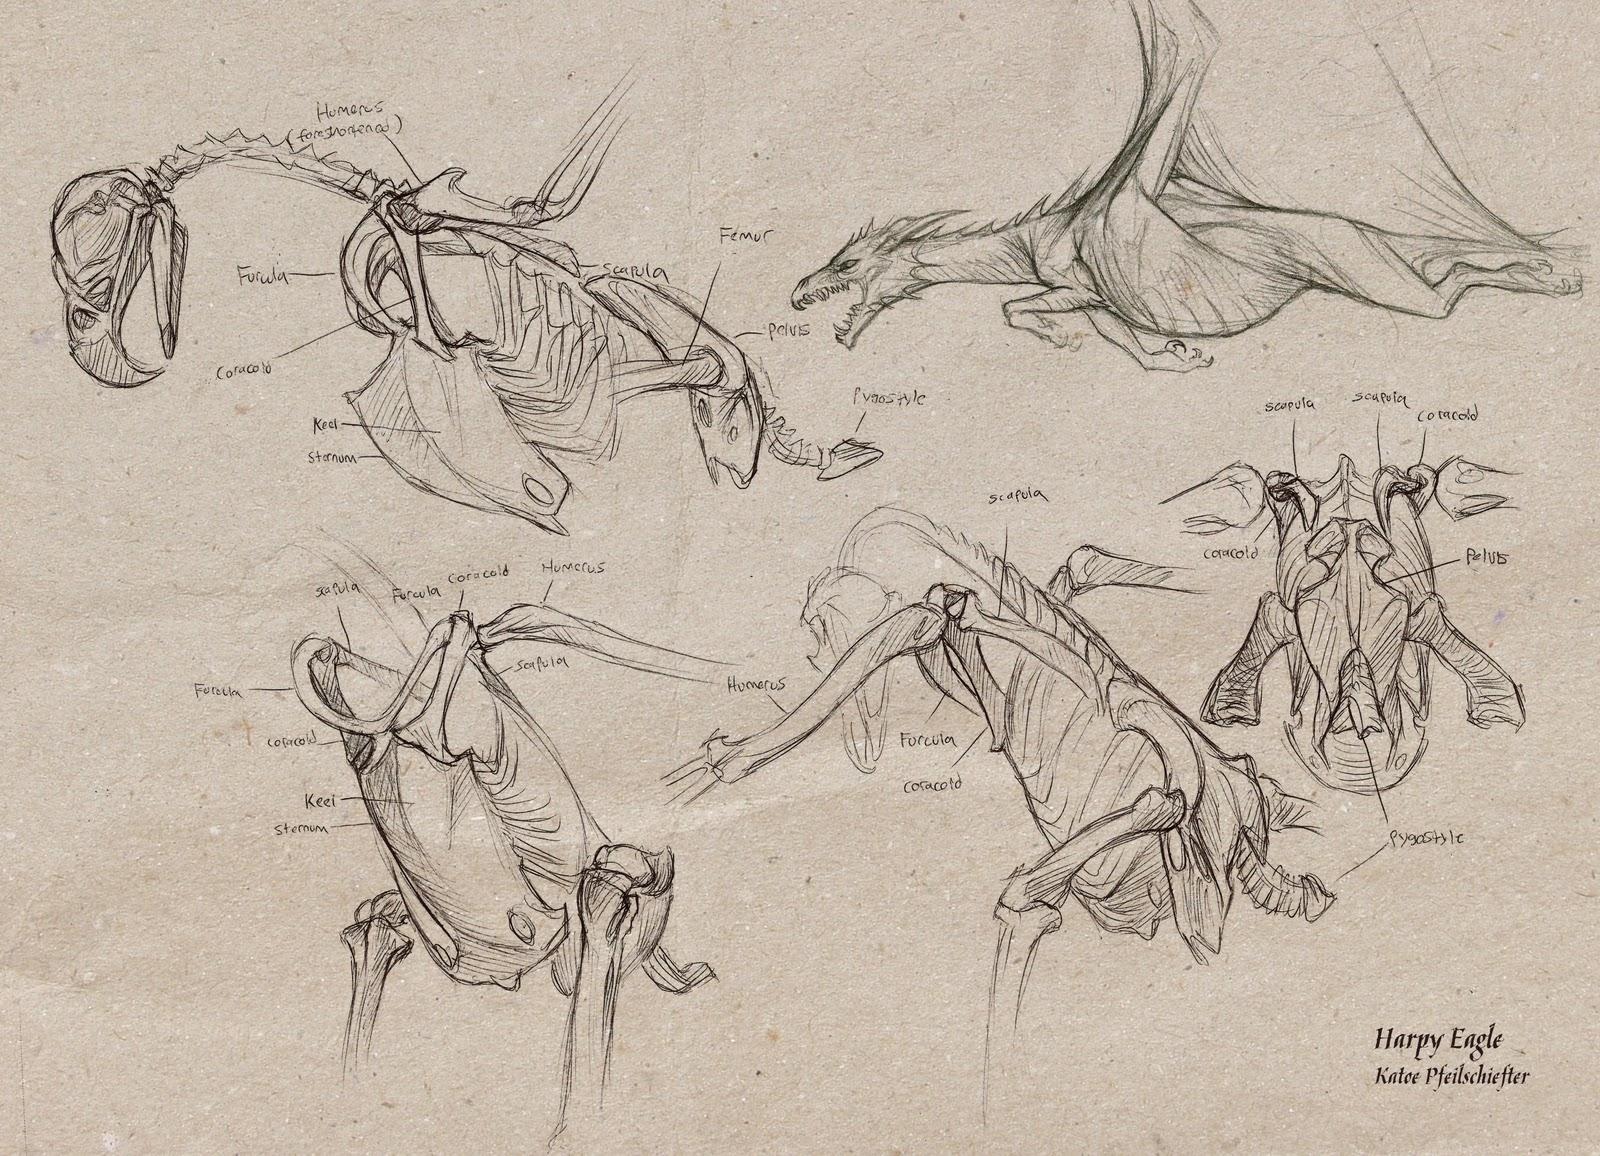 Harpy Eagle Anatomy Bald Diagram Http Wwwexploringnatureorg Graphics Bw Photo7